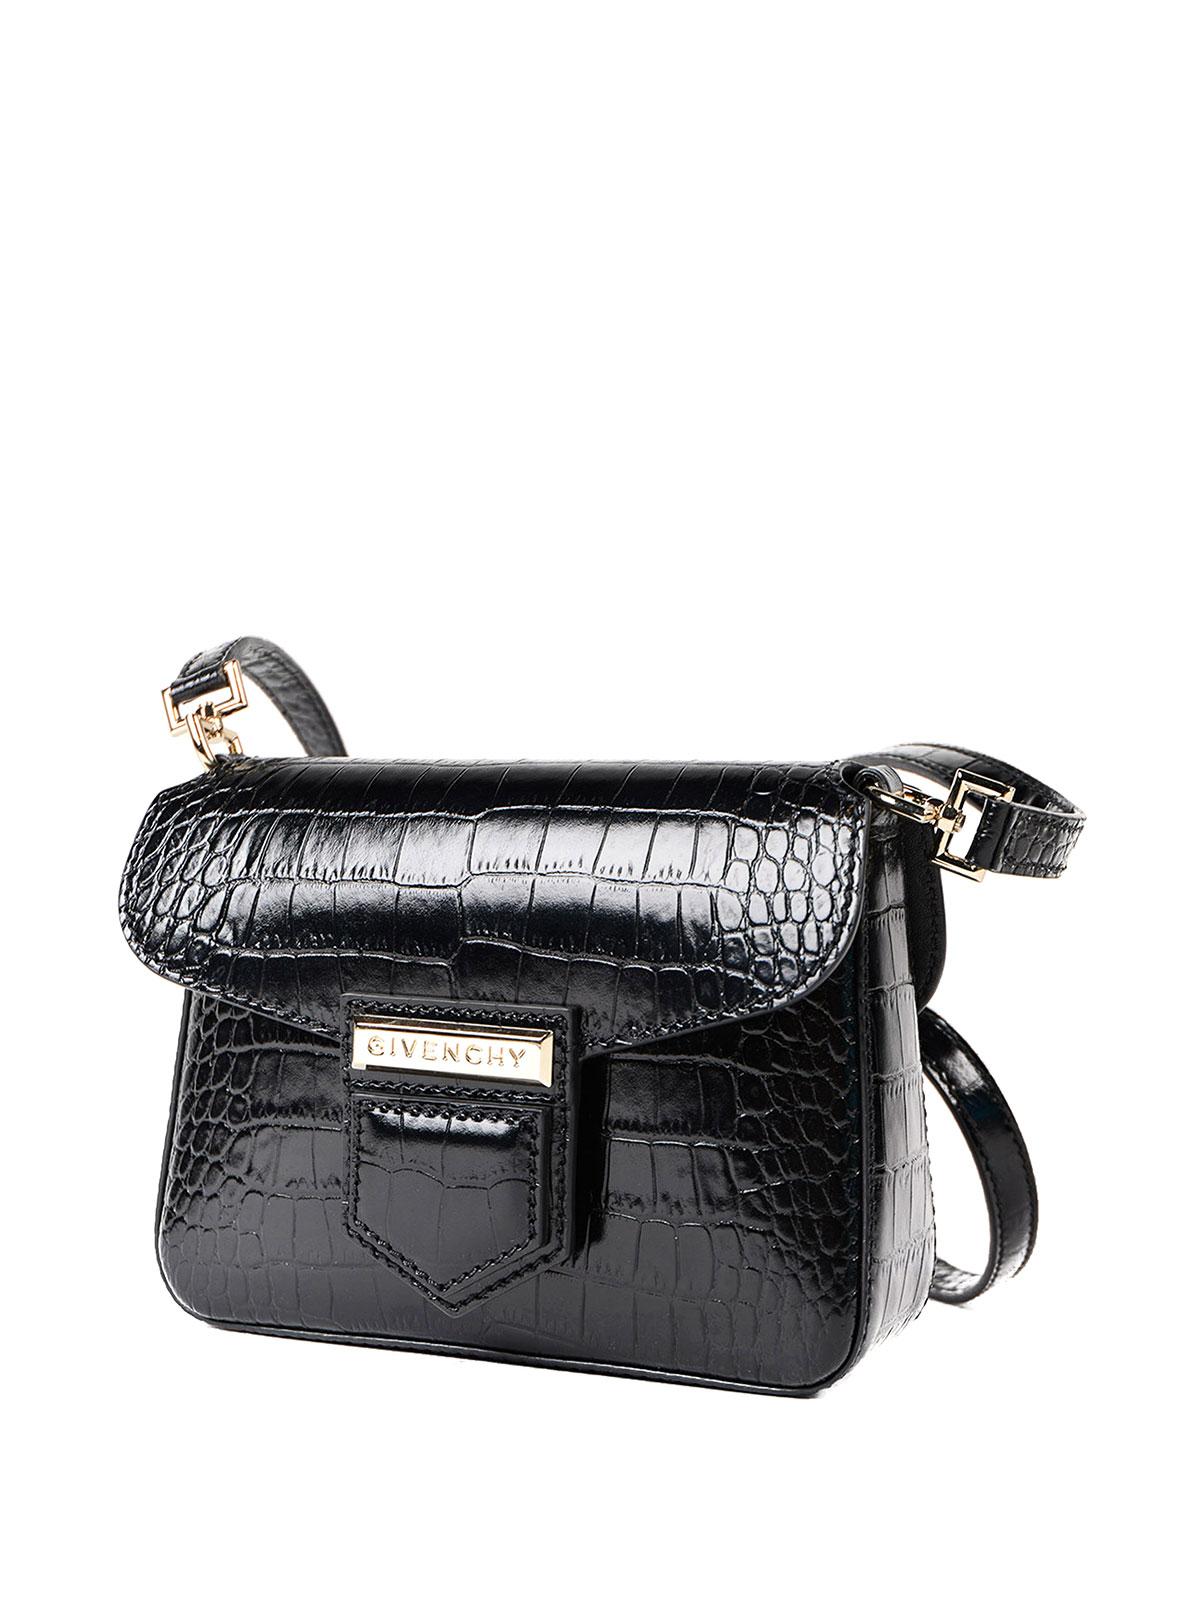 9558373c92 Givenchy - Nobile croco pattern crossbody - cross body bags - 5662472001